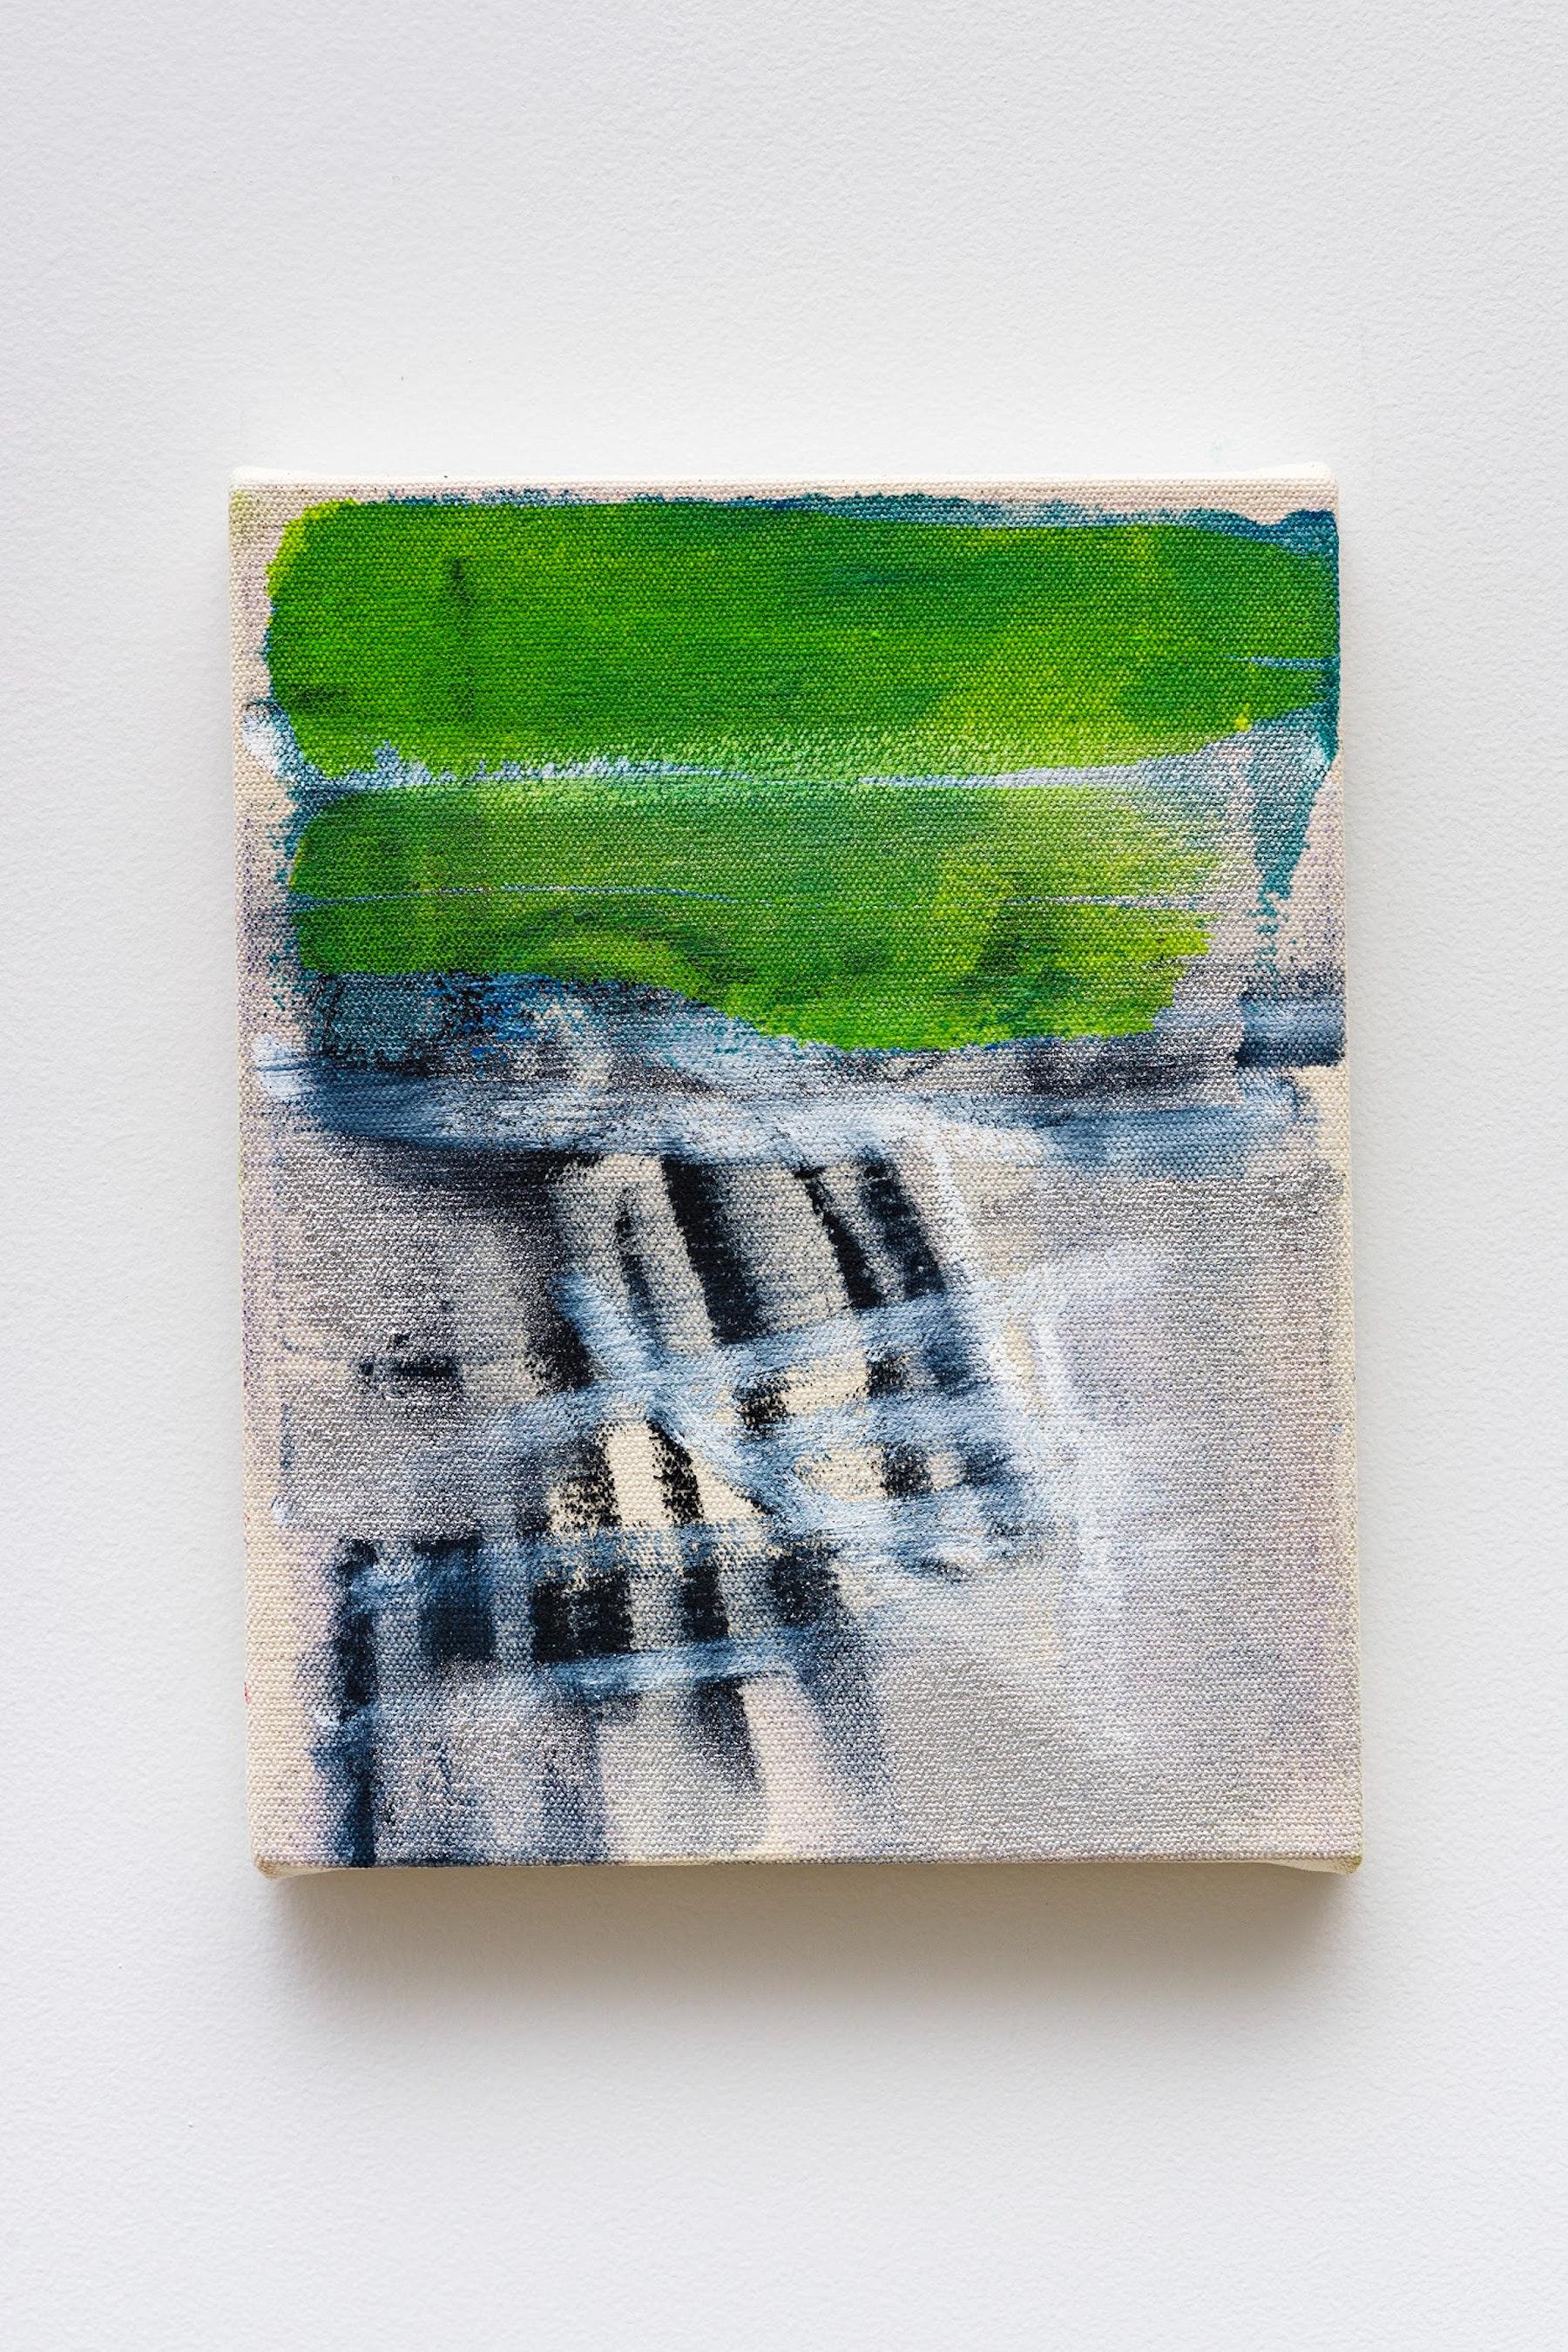 "Monique Van Genderen ""Untitled,"" 2020 Oil on canvas 10 x 8"" [HxW] (25.4 x 20.32 cm) Inventory #VGE400 Courtesy of the artist and Vielmetter Los Angeles Photo credit: Jeff Mclane"